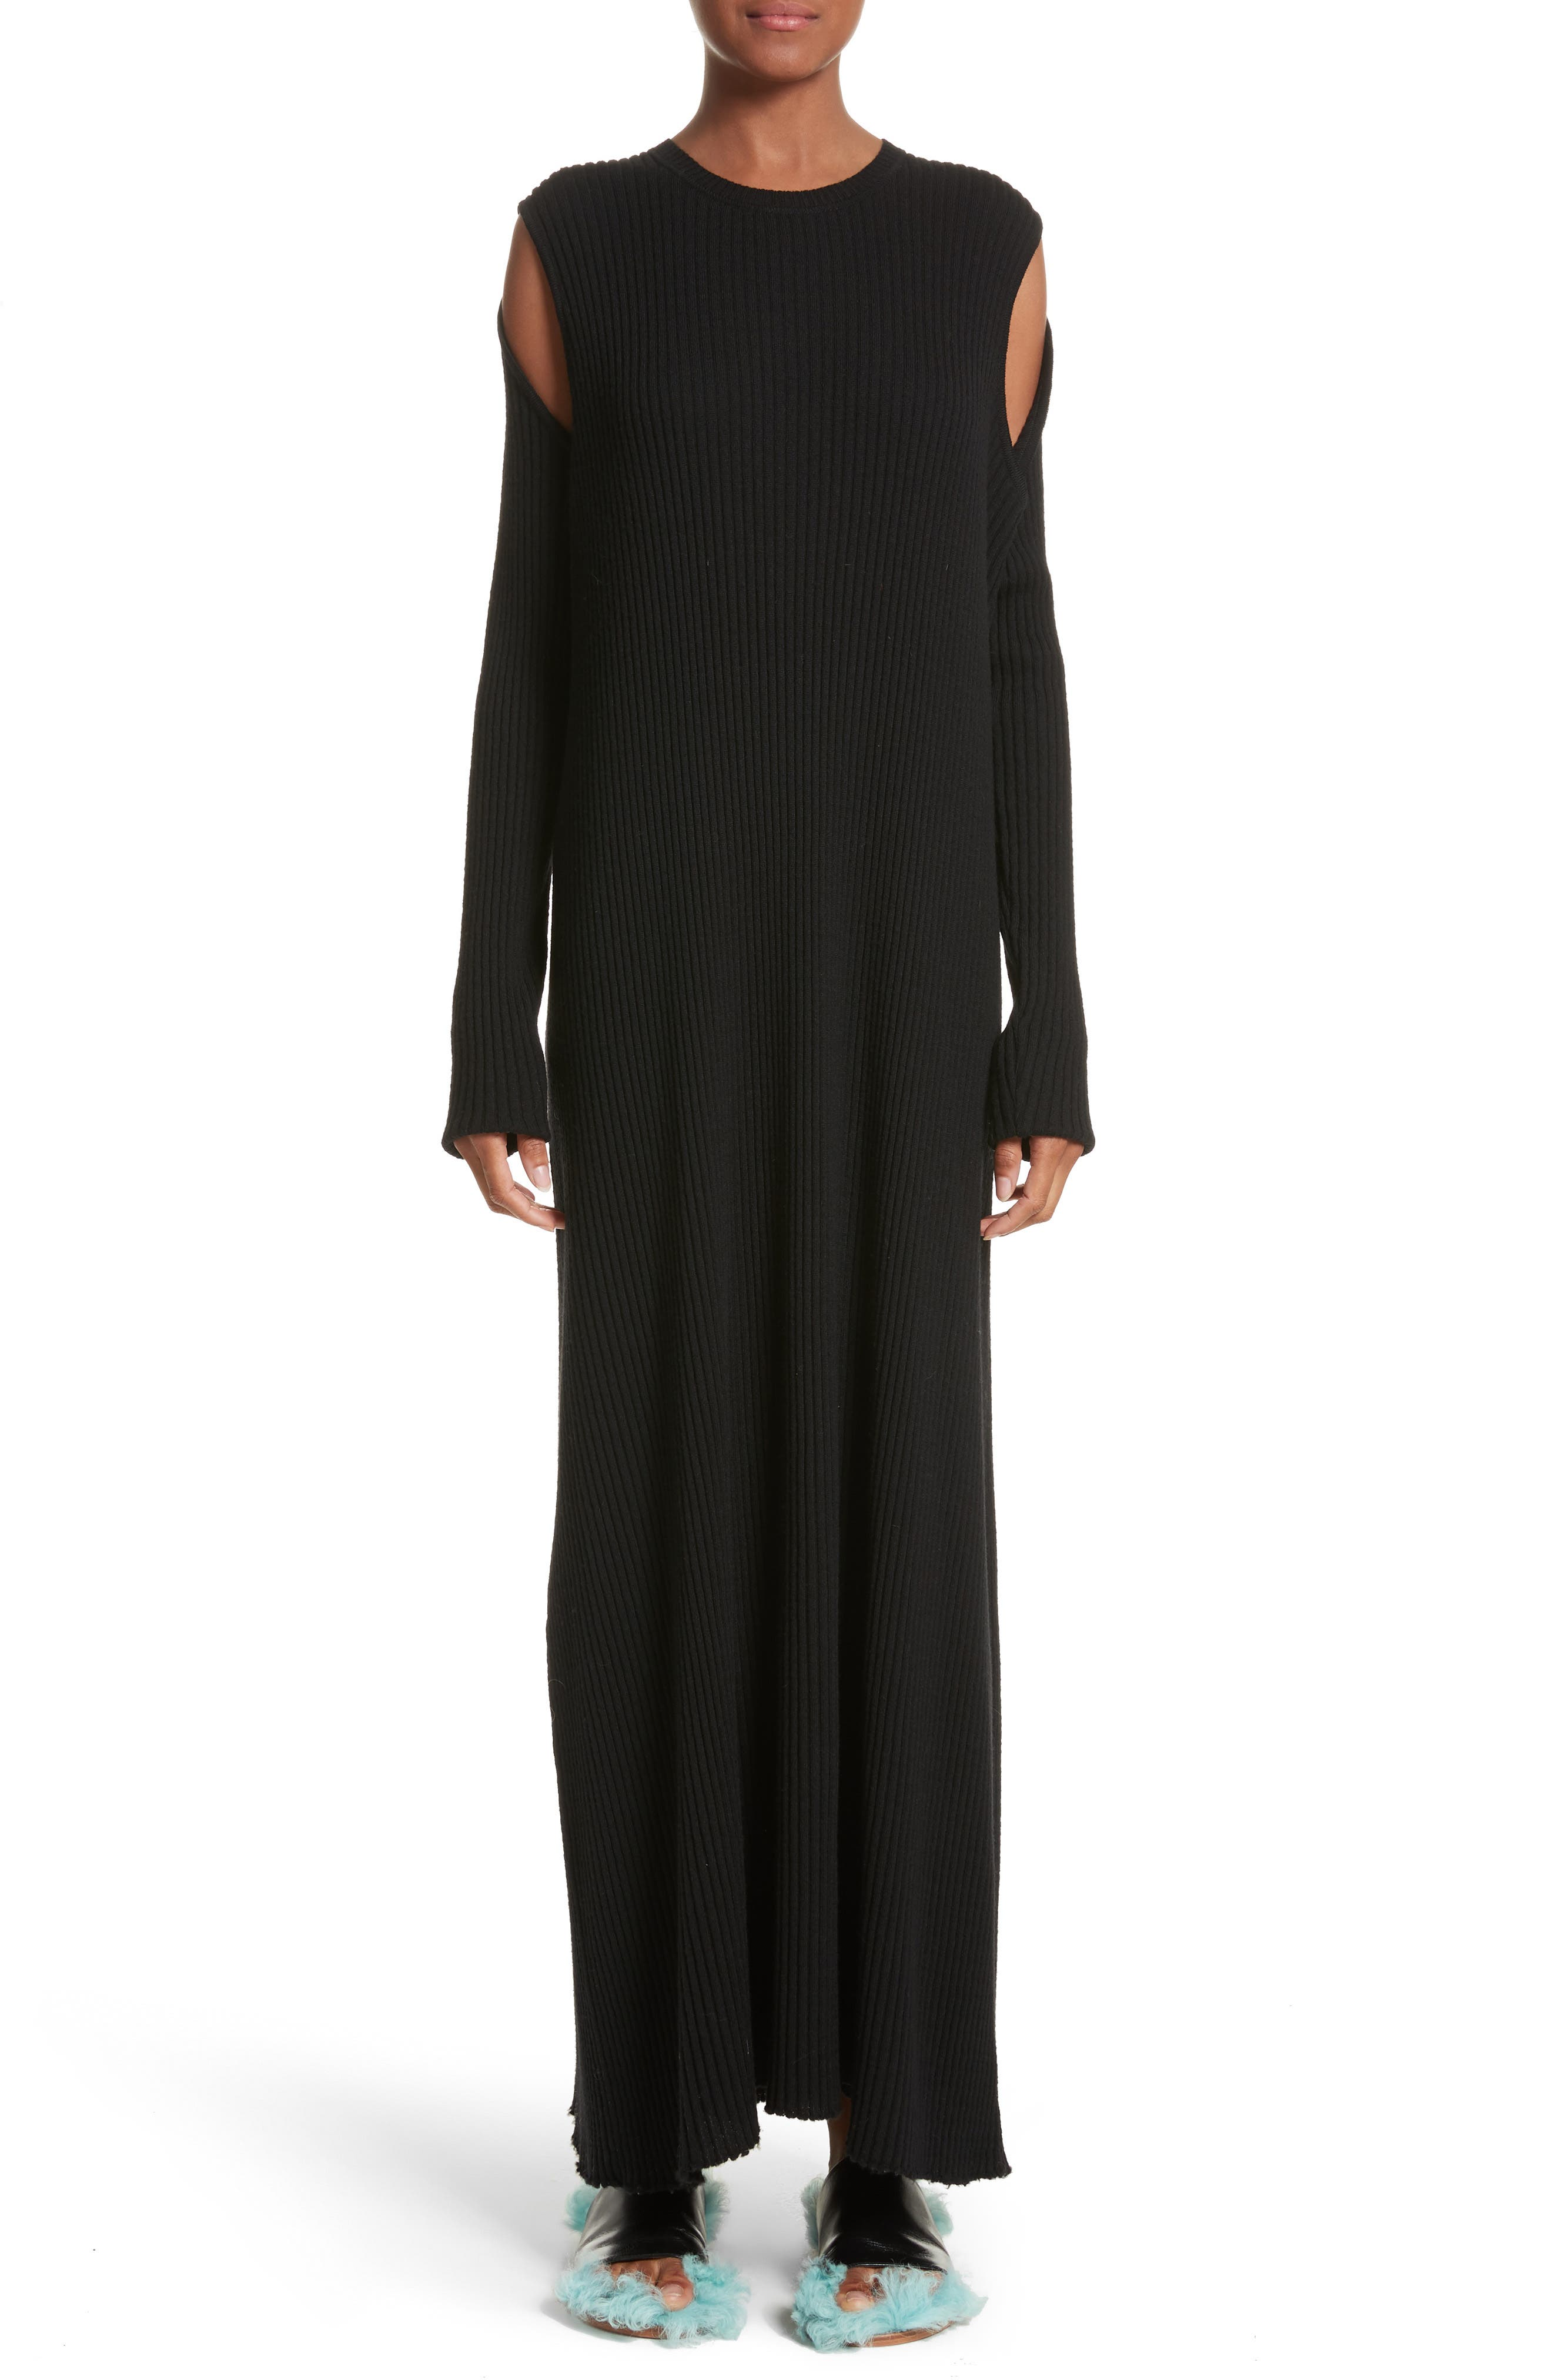 Alternate Image 1 Selected - Marques'Almeida Ribbed Cold Shoulder Maxi Dress